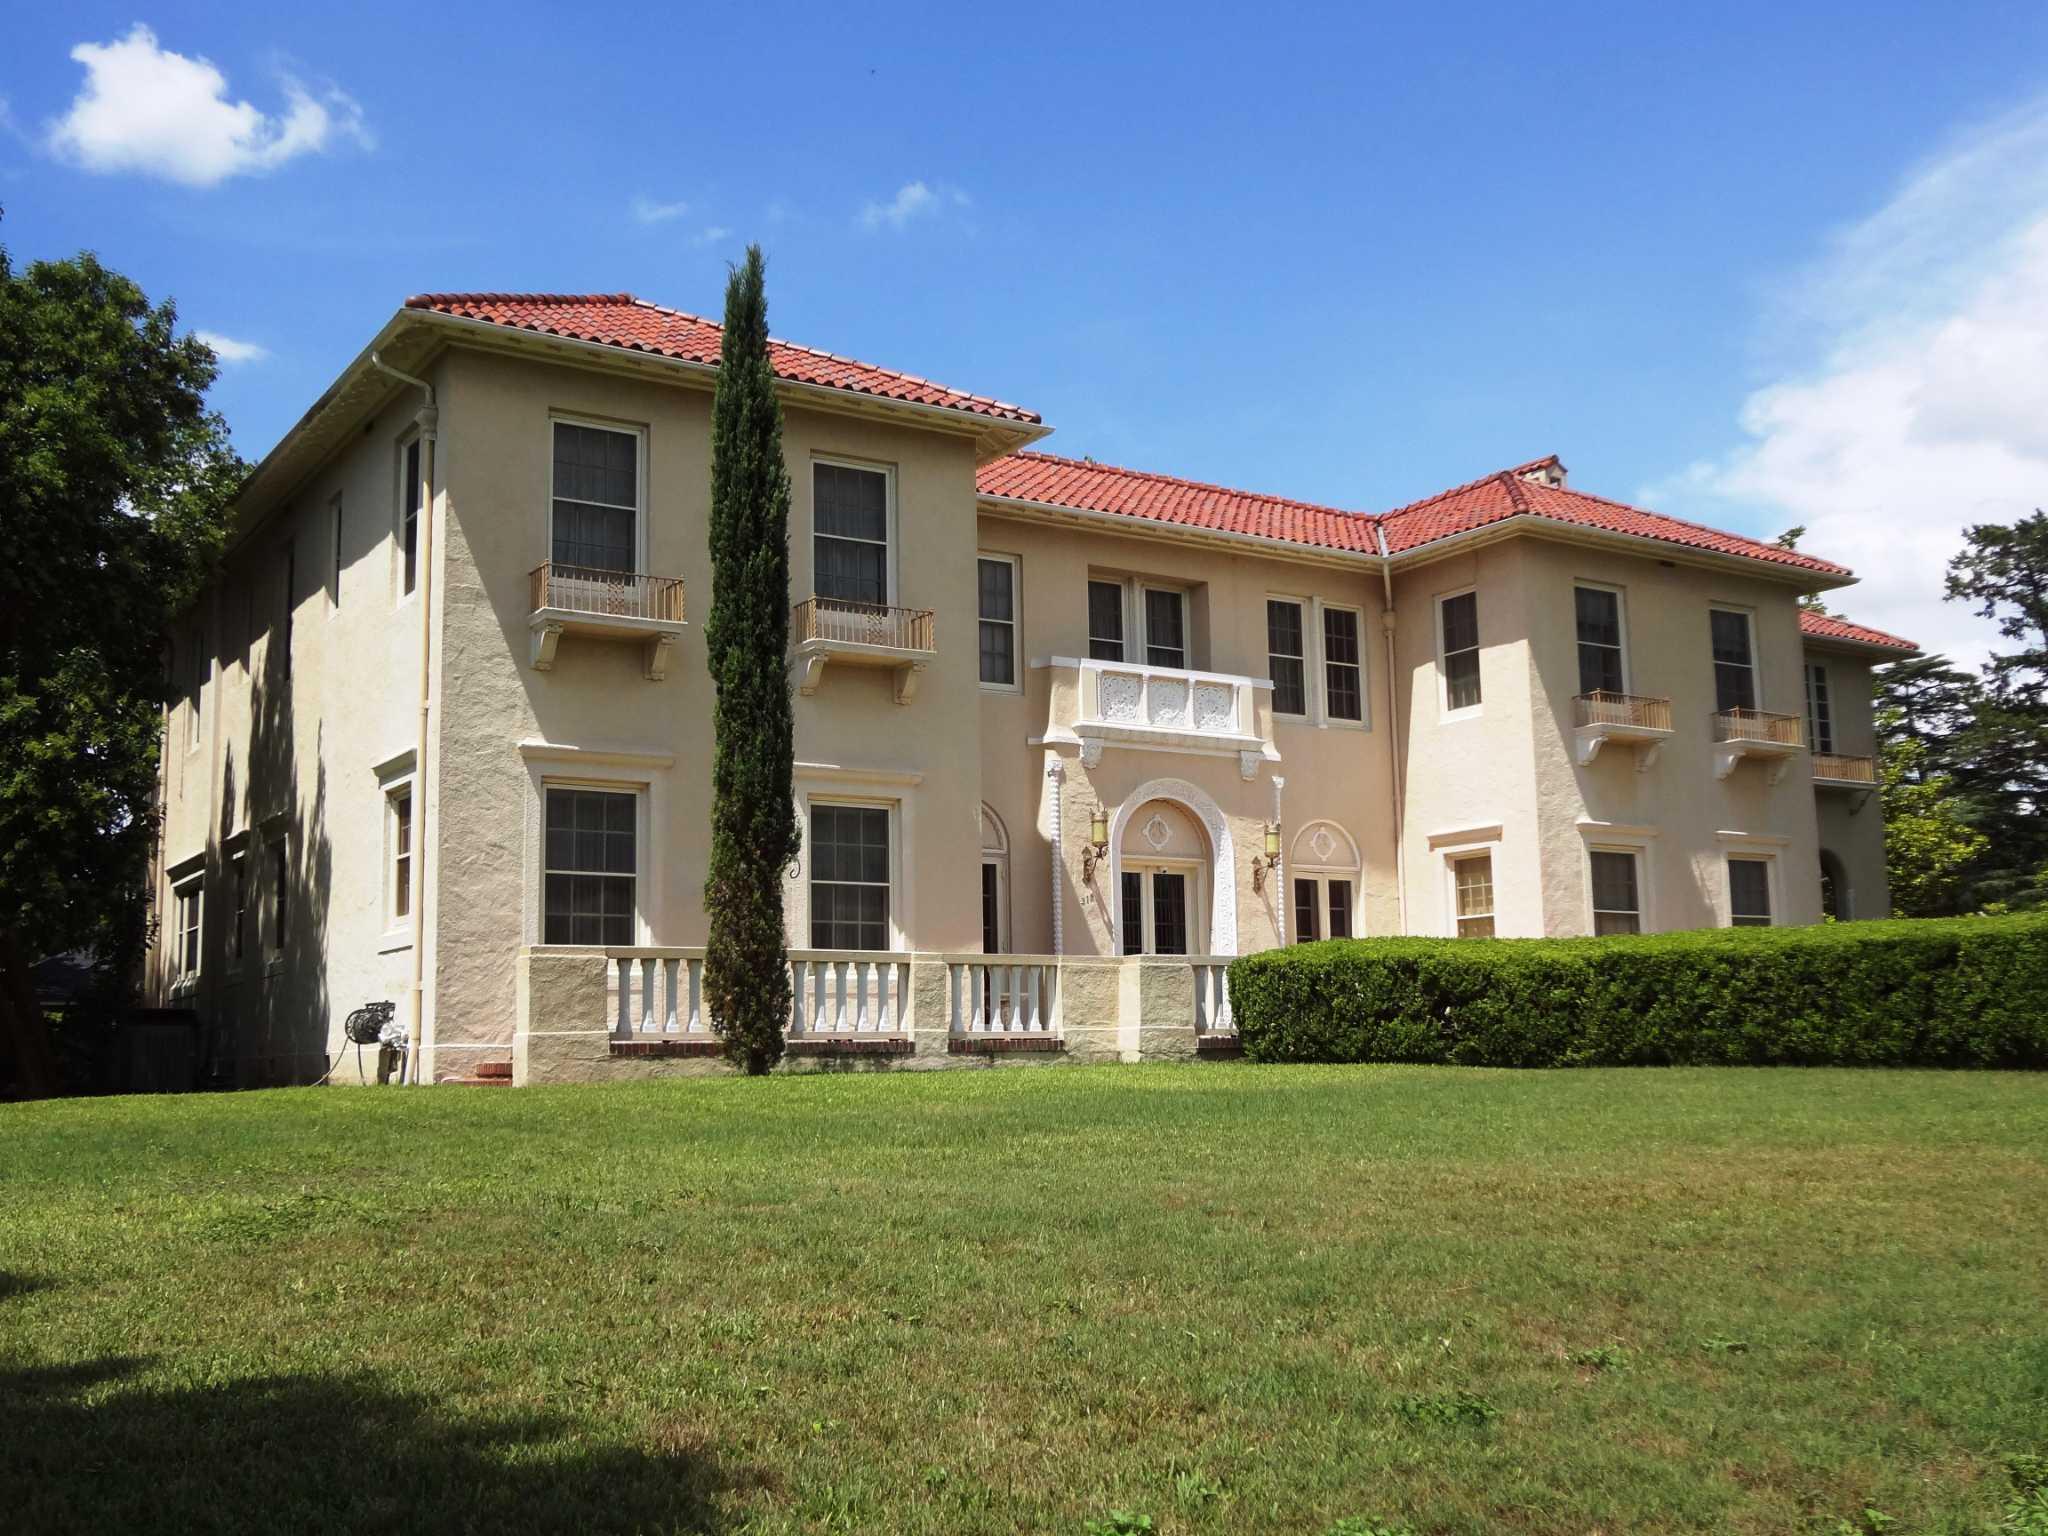 Historic, glamorous Monte Vista home getting a refresh - mySanAntonio.com